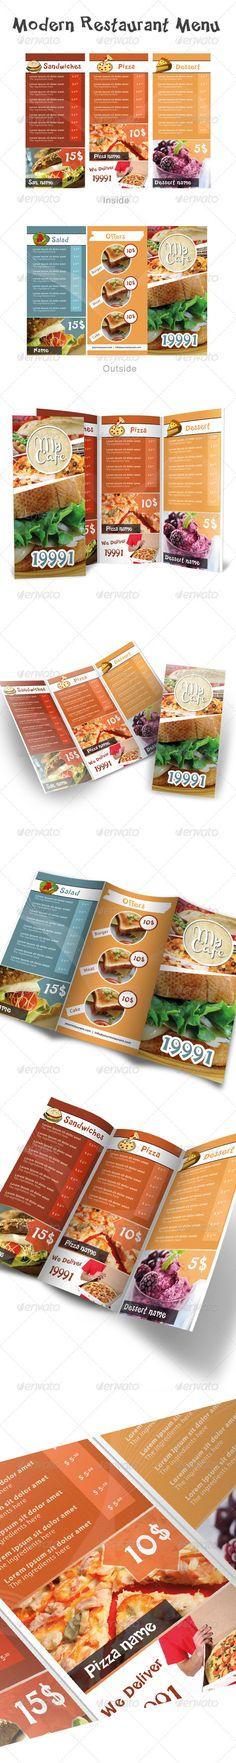 Modern Restaurant Menu - Food Menus Print Templates Download here : http://graphicriver.net/item/modern-restaurant-menu/393560?s_rank=1507&ref=Al-fatih